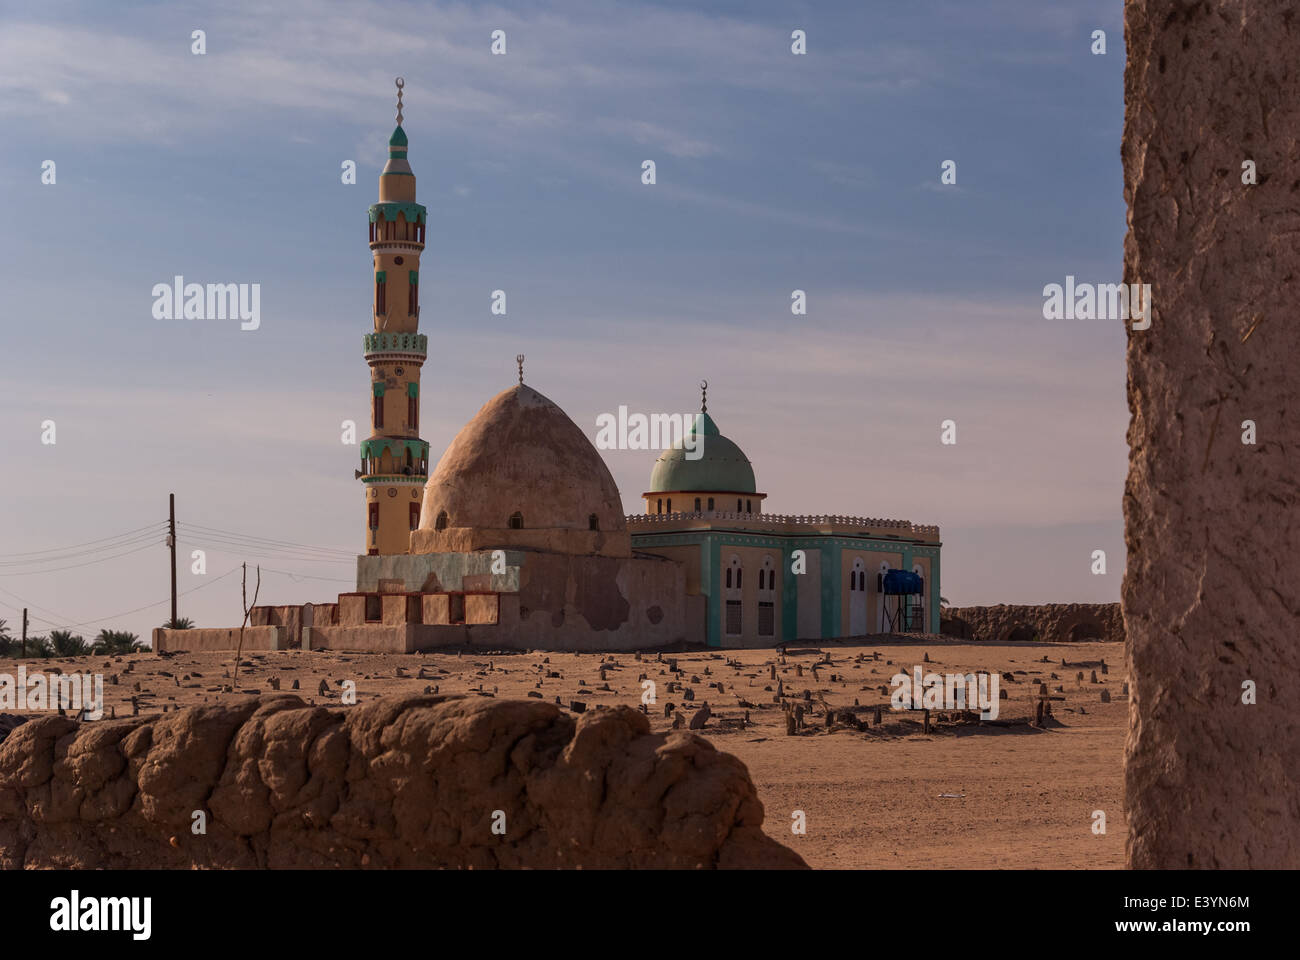 Mosque, Mazaar (mausoleum) and Muslim cemetery, near Merowe, northern Sudan - Stock Image